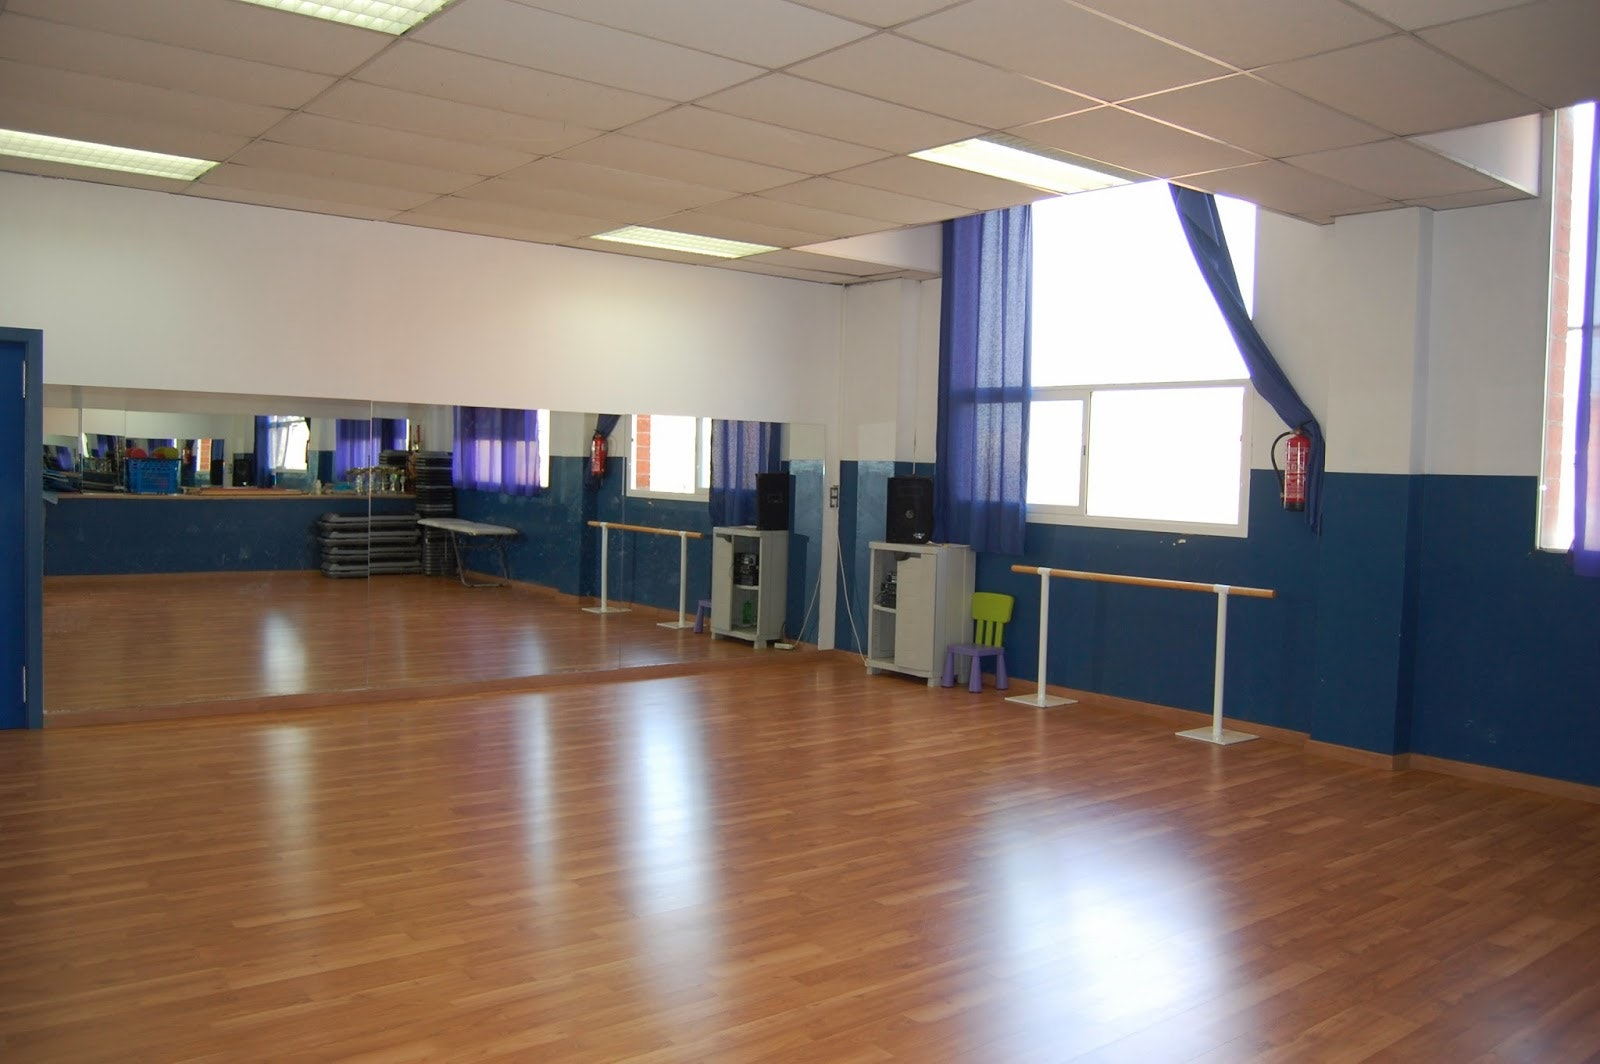 Shen Dragon & Selecta Dance School